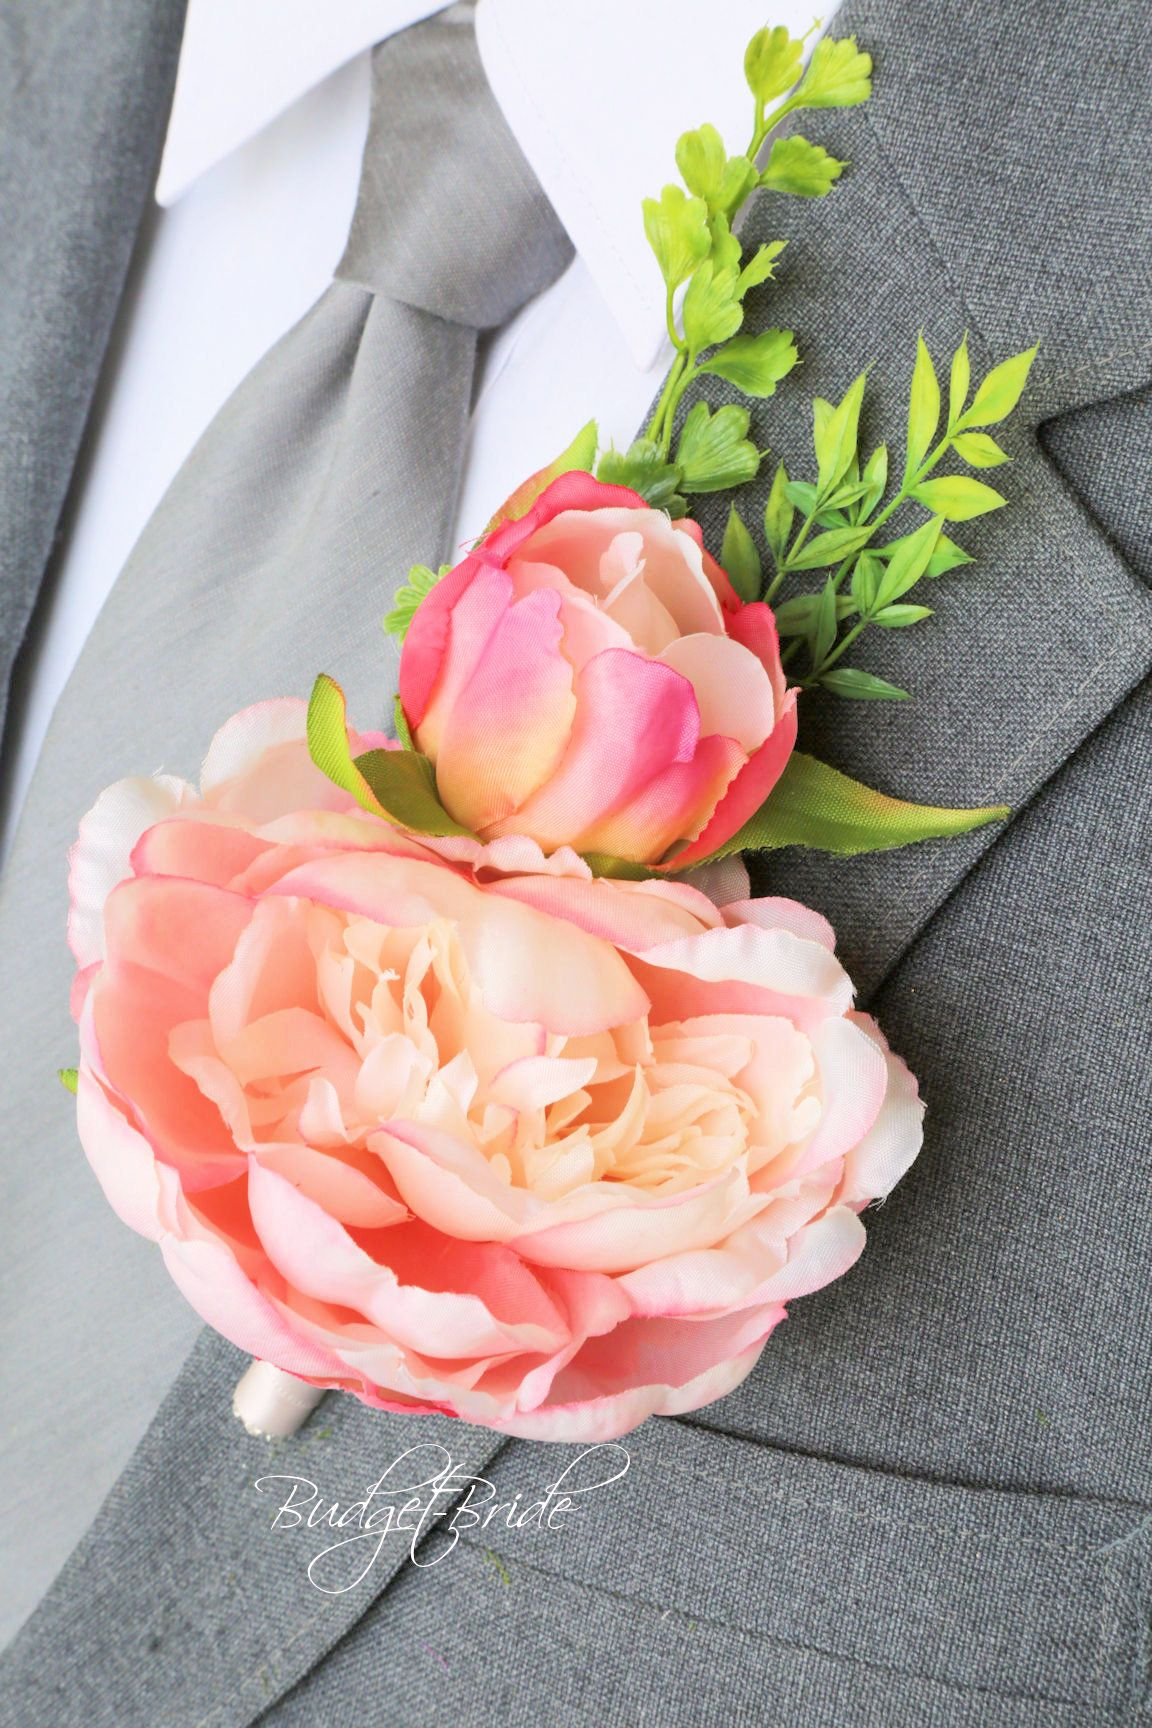 Blush davids bridal wedding flowers pink peony boutonniere grey suit blush davids bridal wedding flowers pink peony boutonniere grey suit button hole mens flowers izmirmasajfo